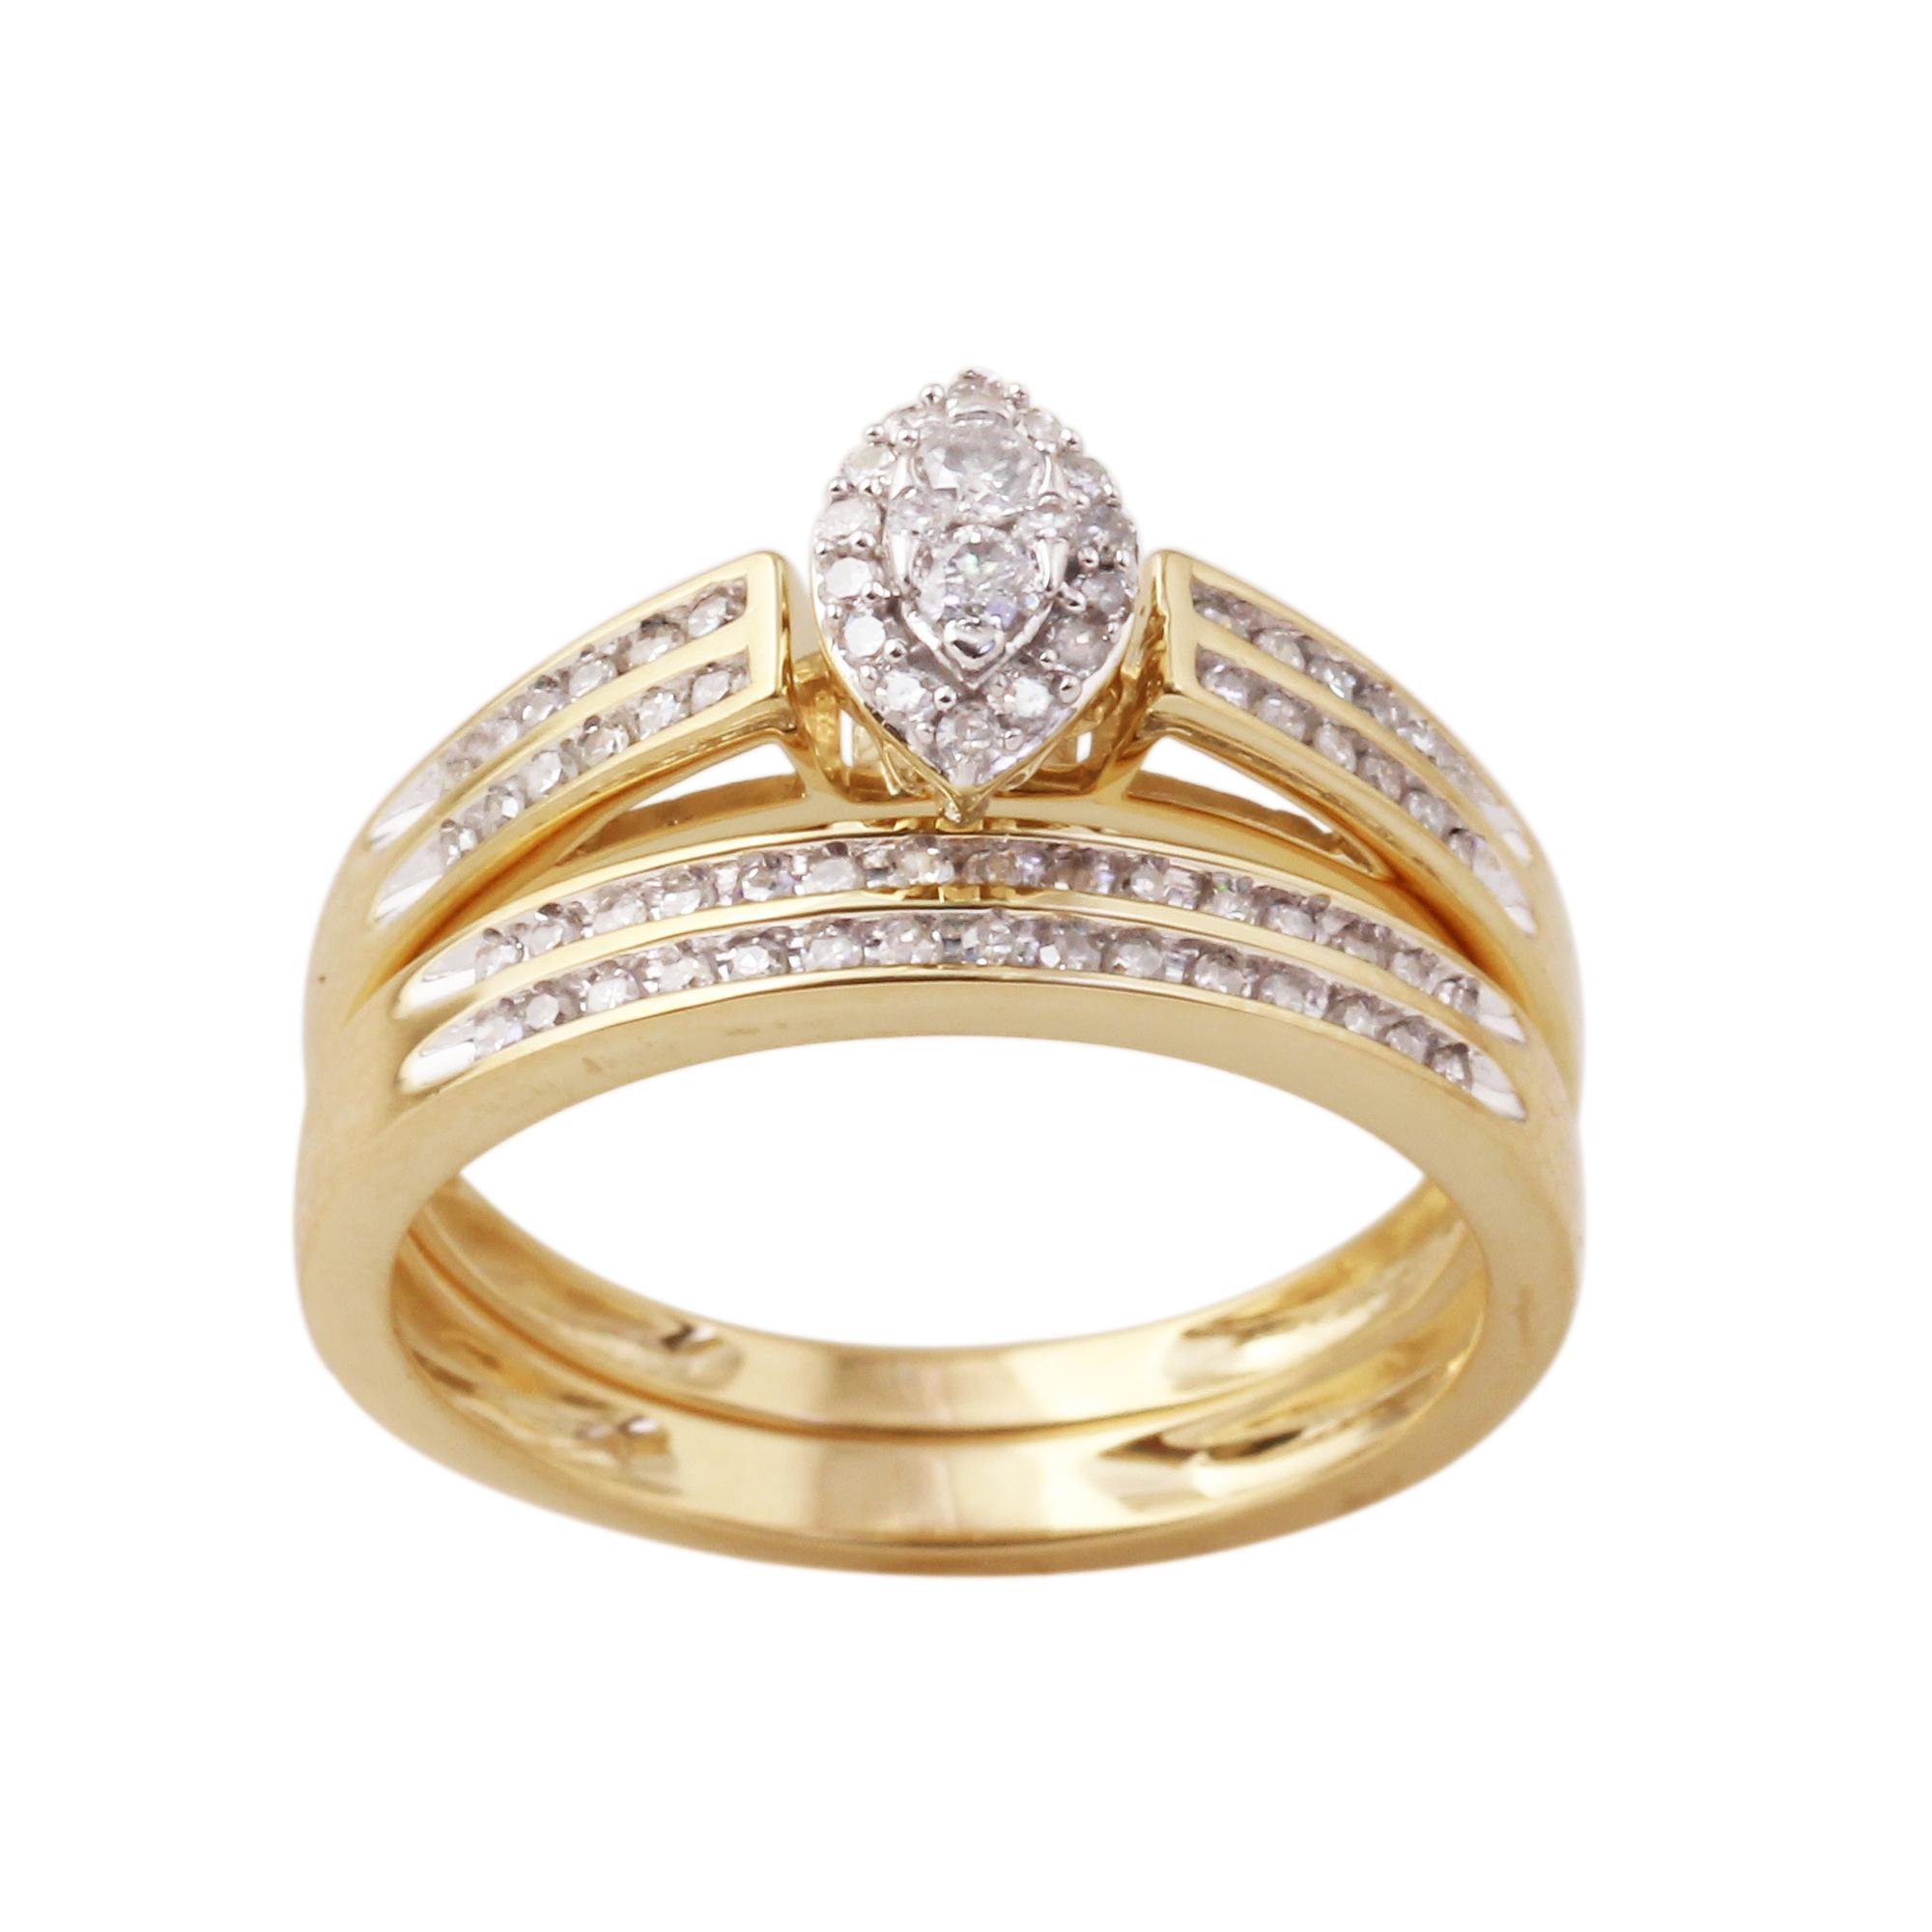 10K Yellow Gold 38 Cttw Certified Diamond Ladies 2 Pc